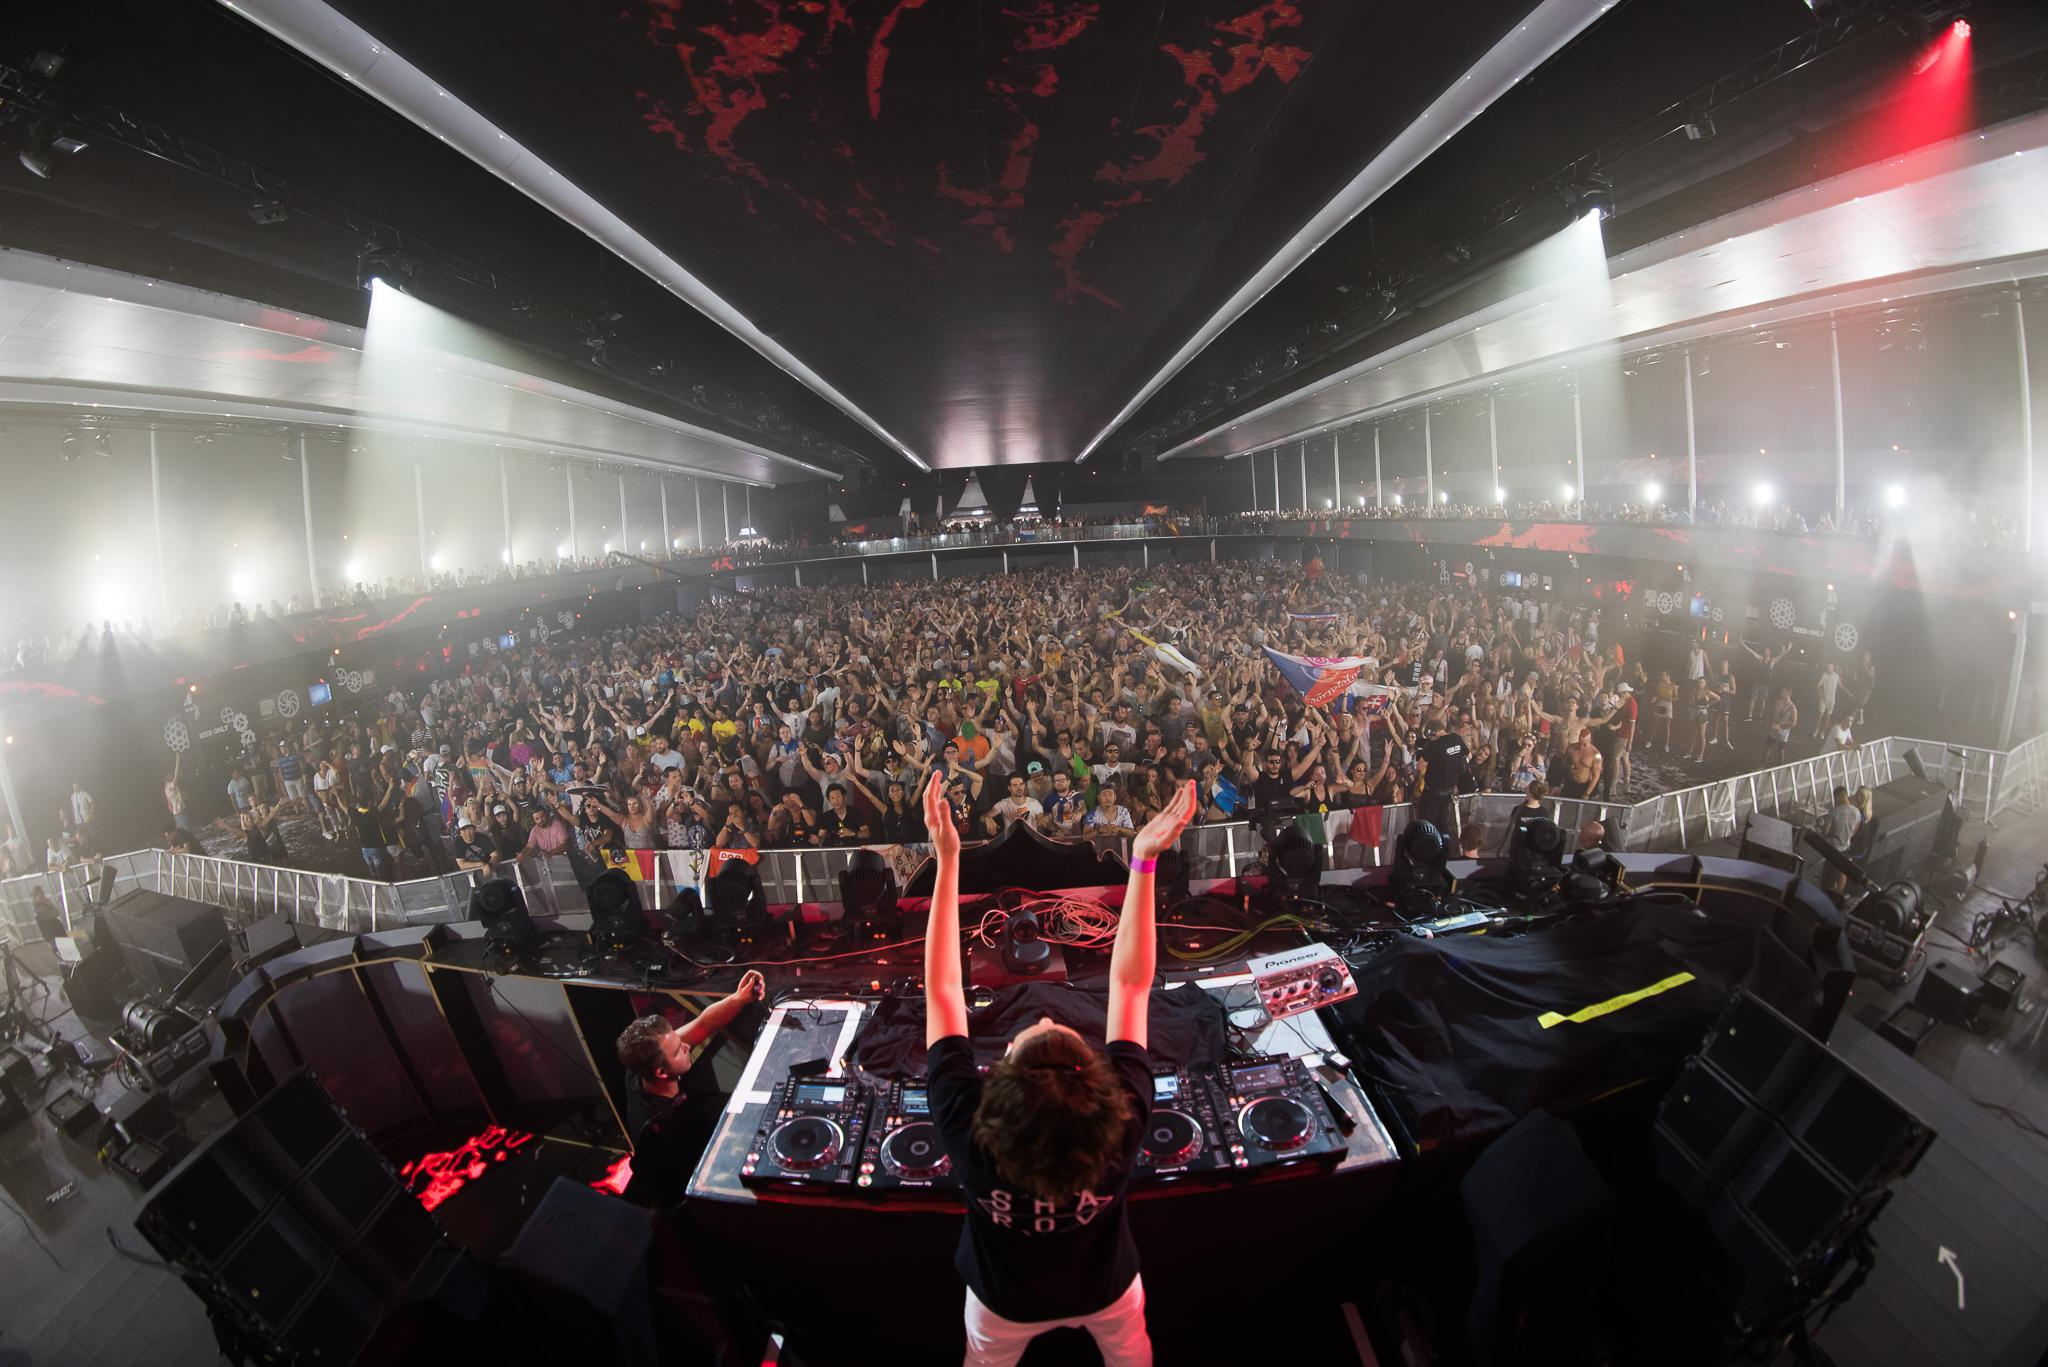 Axtone_Tomorrowland_PavelKuna_WEB155